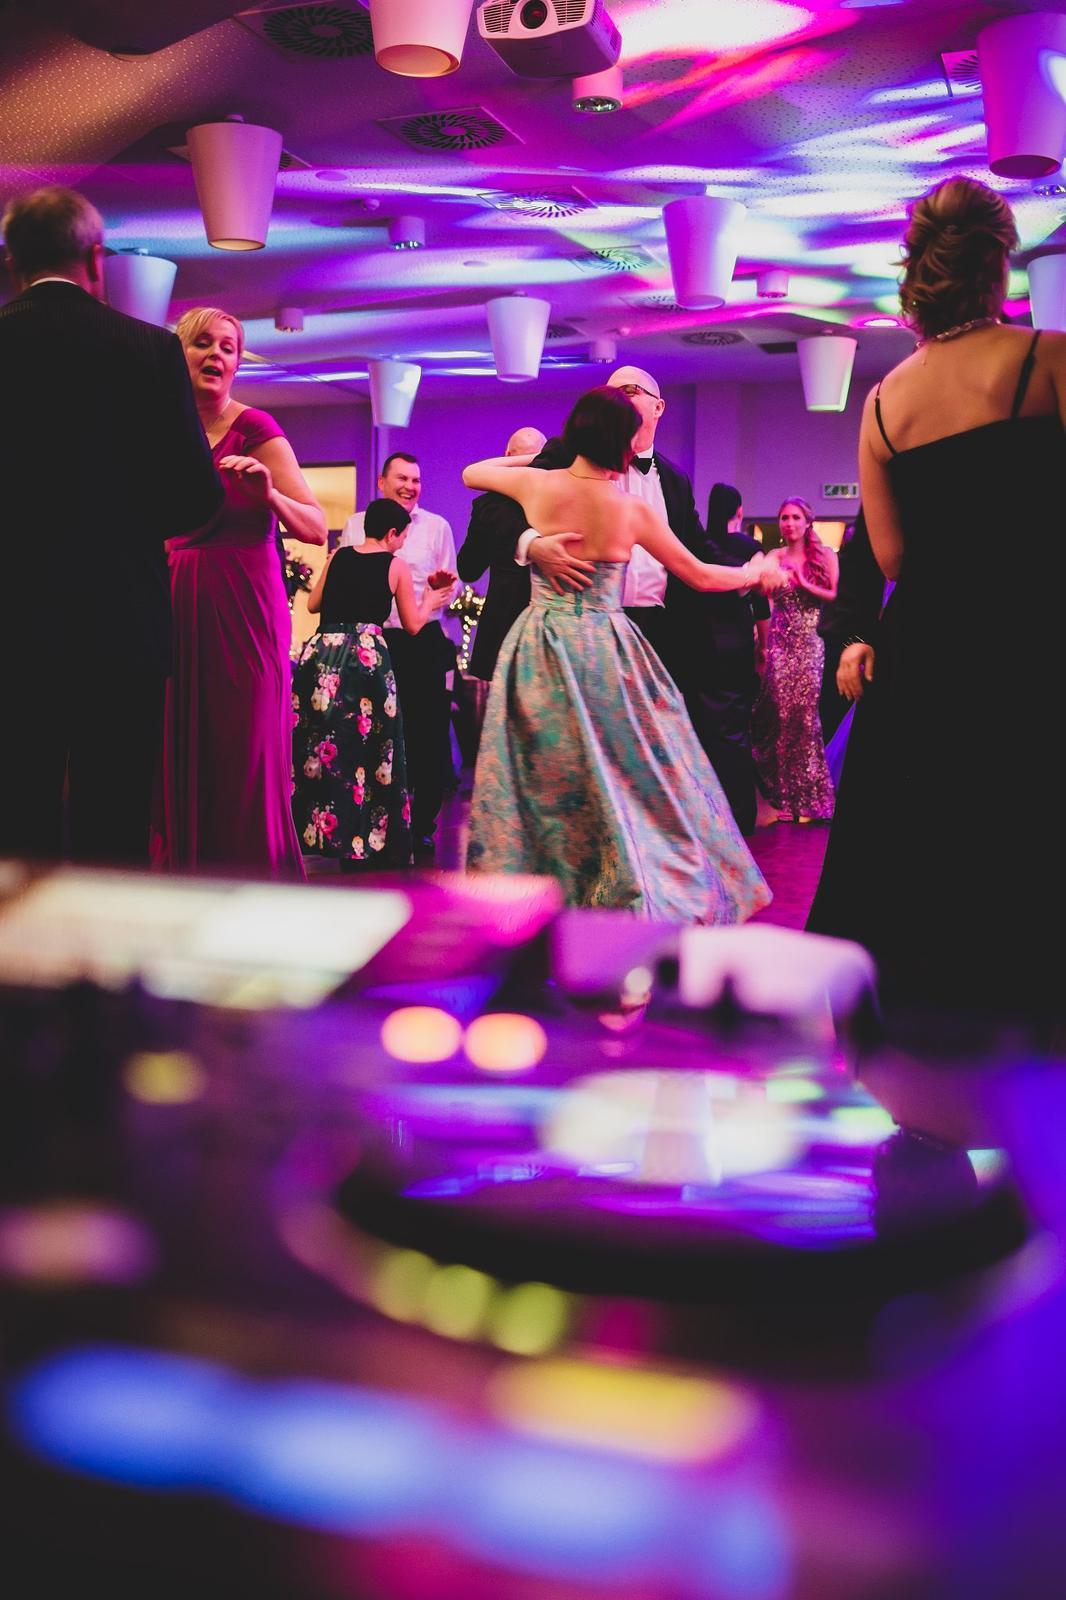 sunrise_nasvietenie_saly - dj eLLy d_Reprezentačný ples Hotela Astrum Laus Levice (foto Damián Macho)